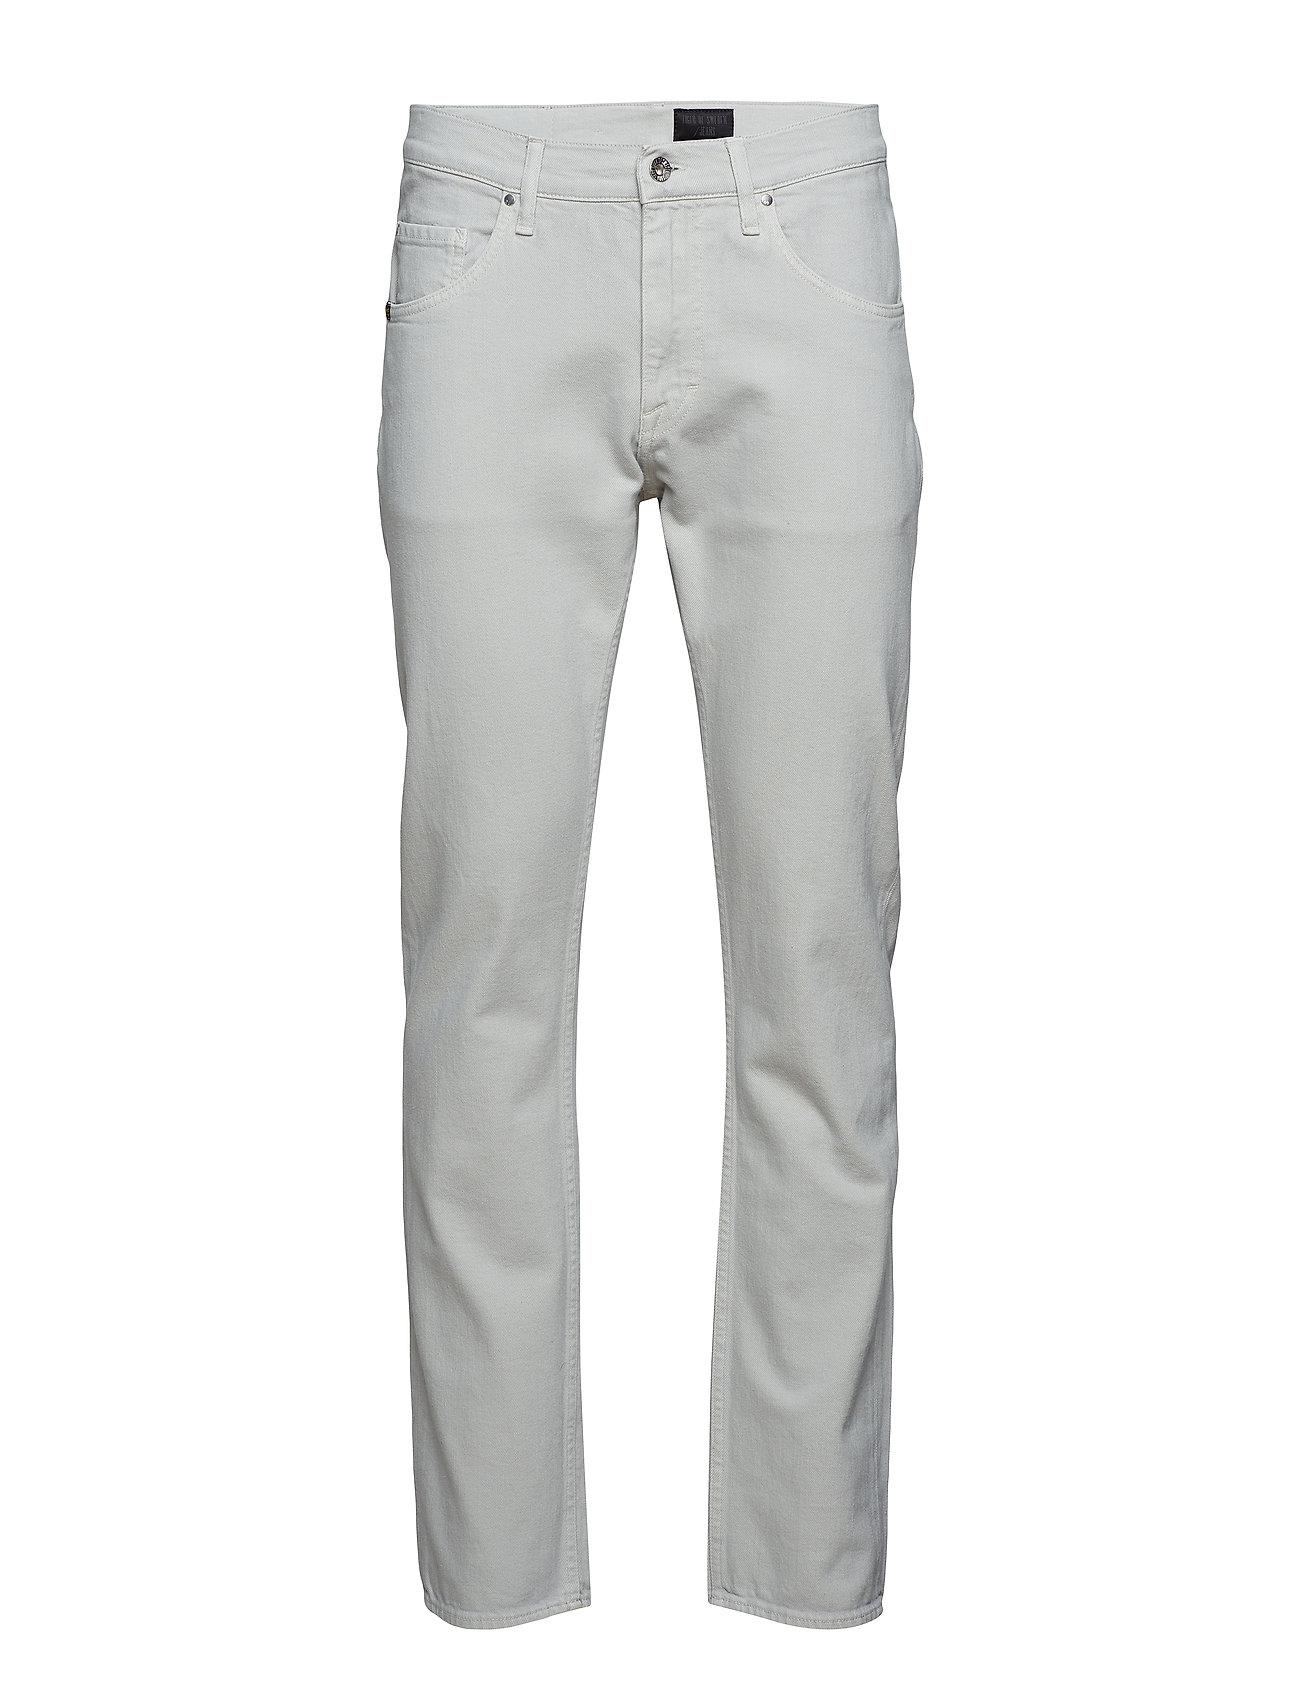 a27f850bb2 Iggy... (Ivory) (59.50 €) - Tiger of Sweden Jeans - | Boozt.com